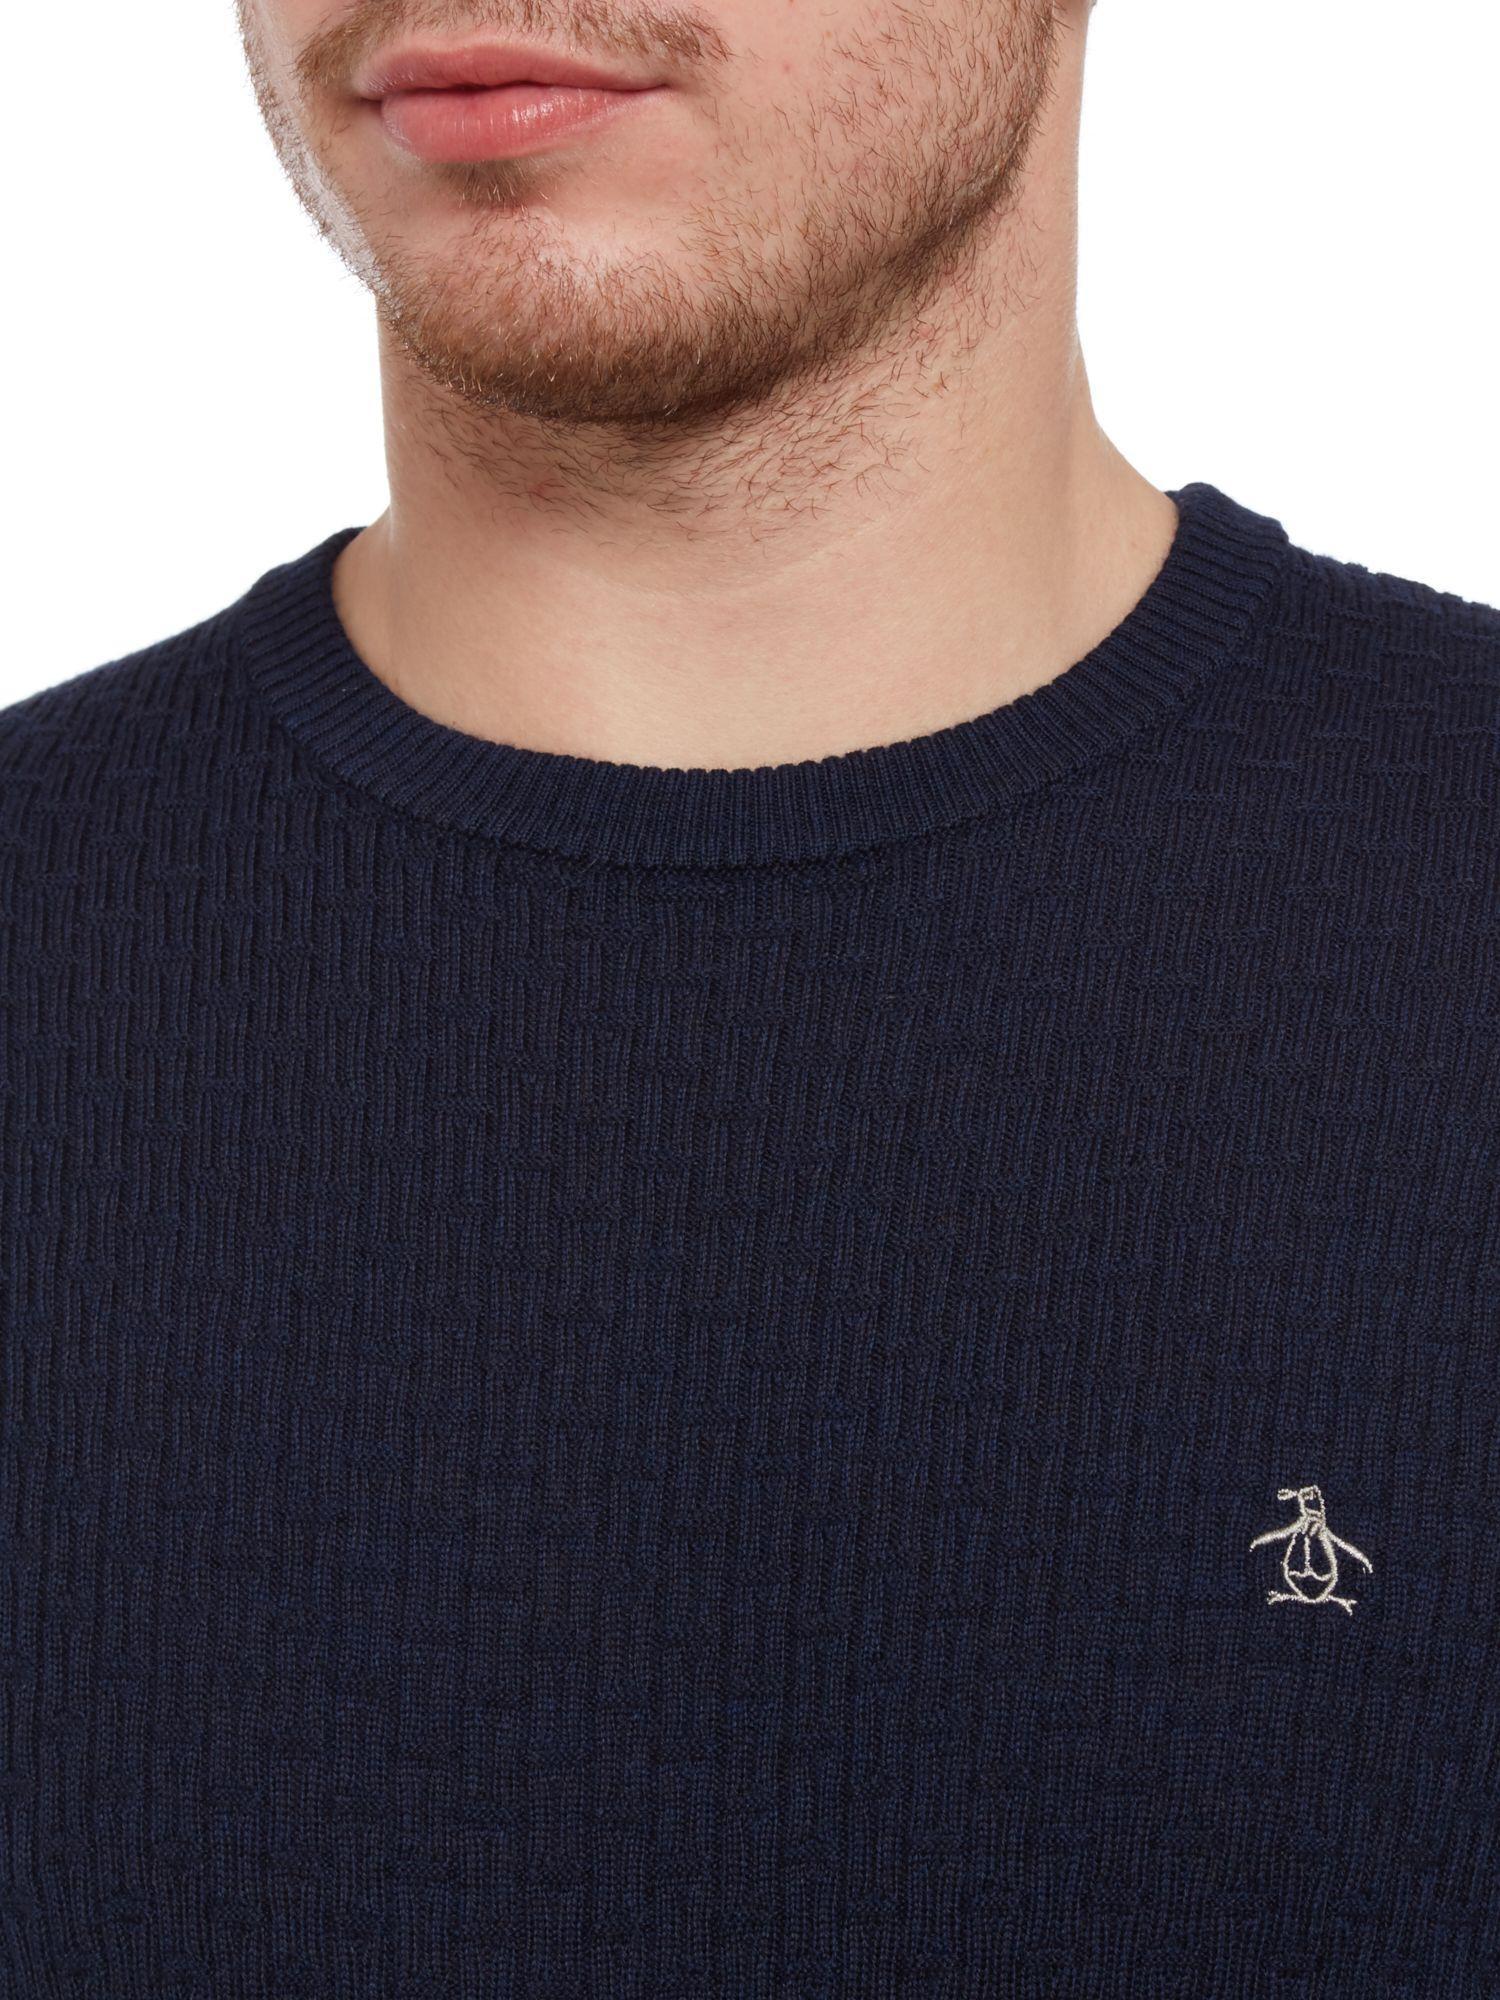 Original Penguin Wool Merino Basketweave Crew Neck Jumper in Navy (Blue) for Men